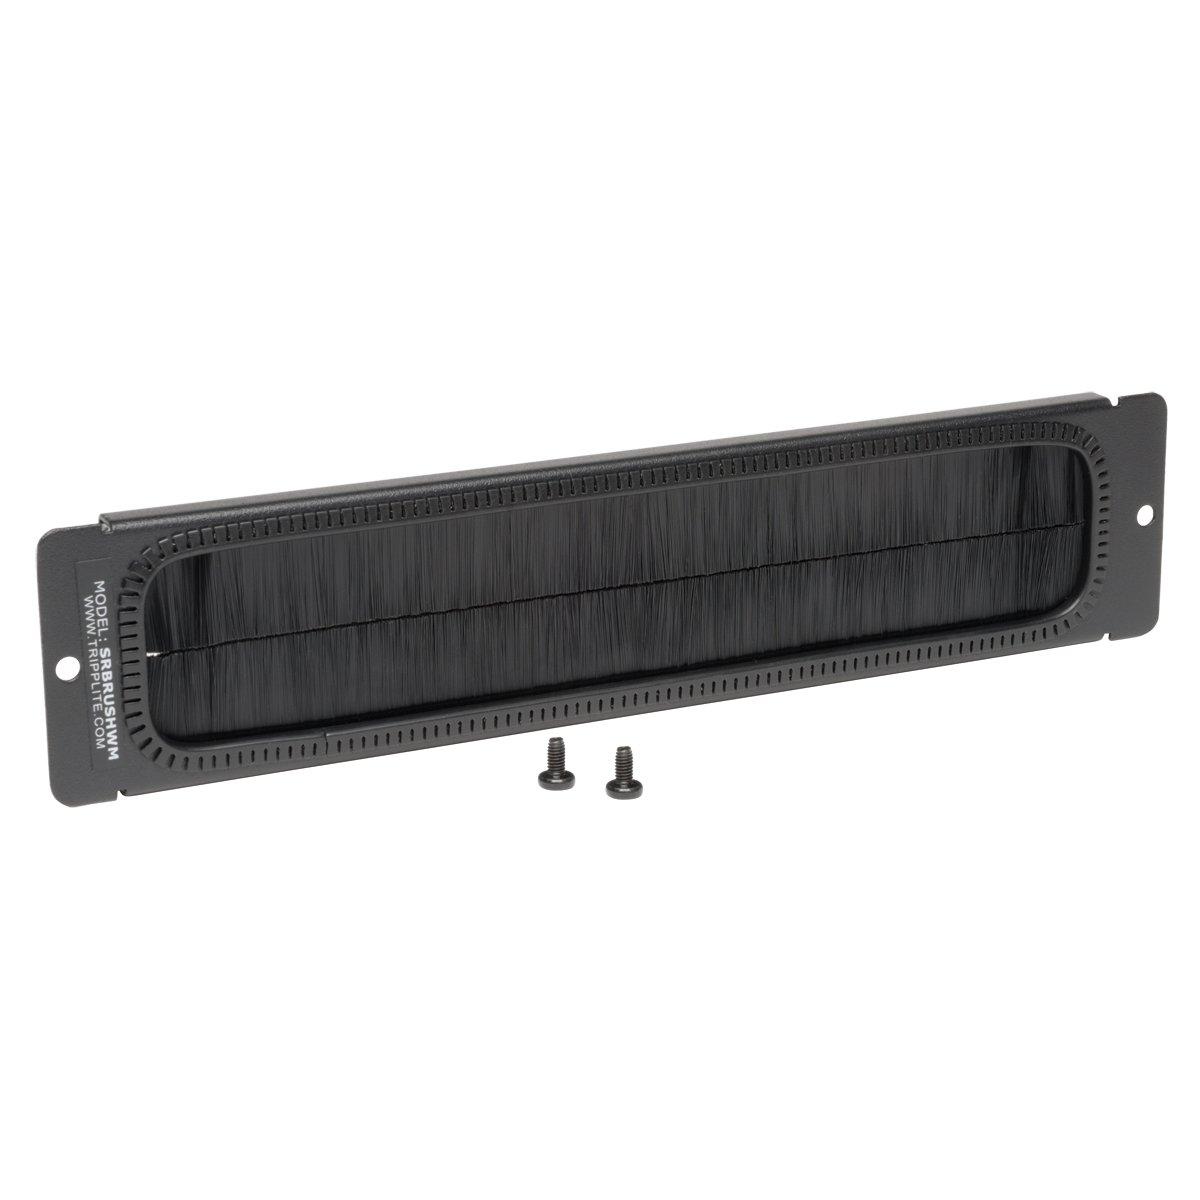 TRIPP LITE Brush Strip Plate for Wallmount Rack Enclosure Server Cabinet (SRBRUSHWM)